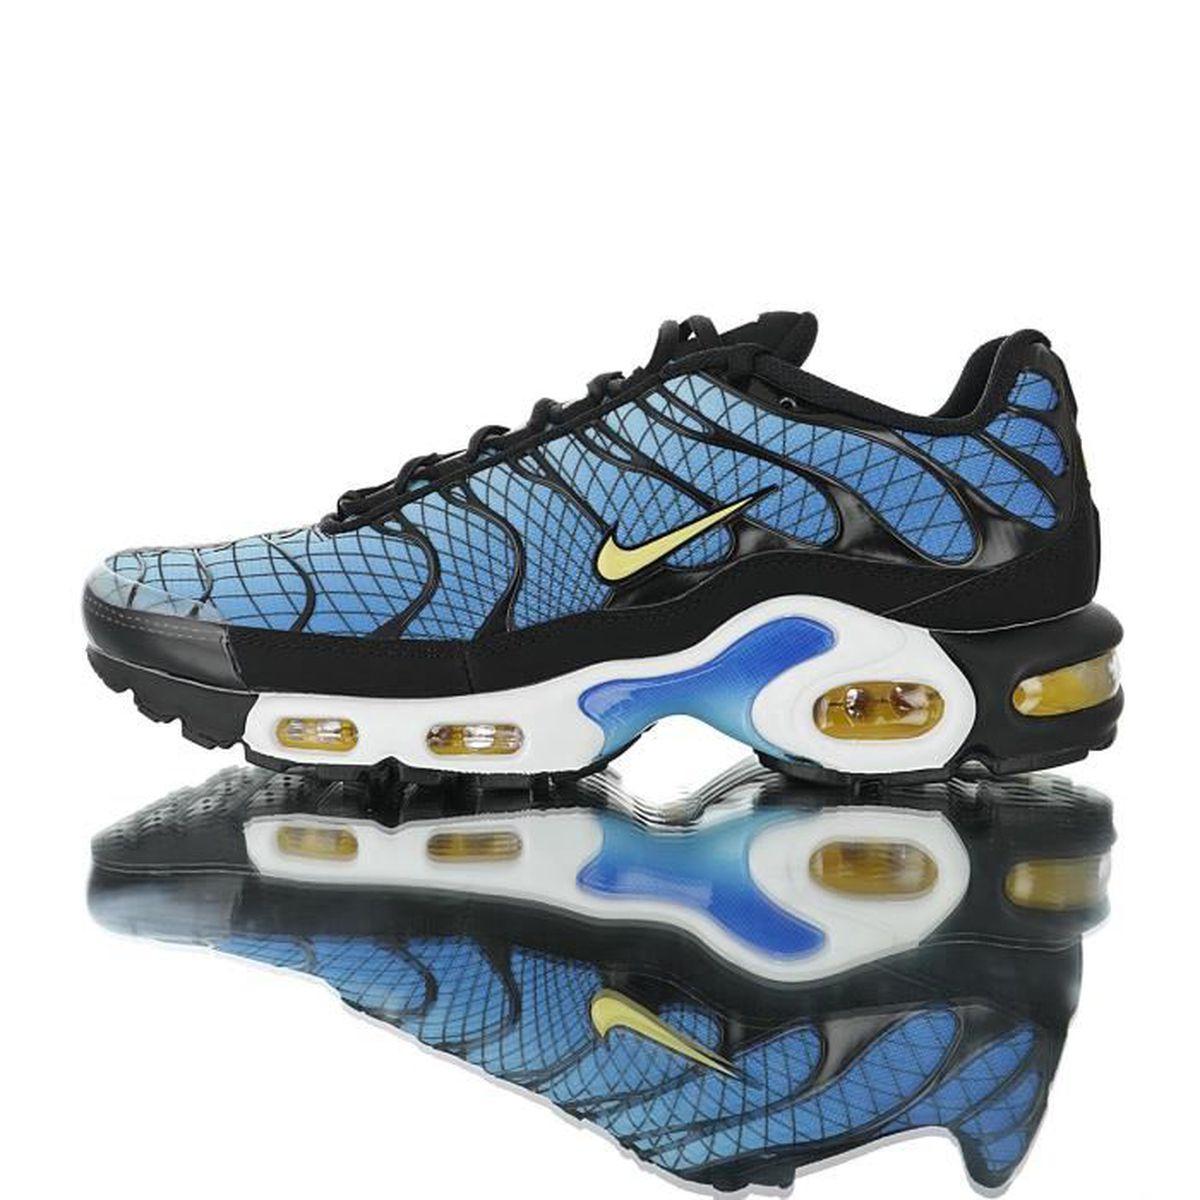 Baskets Nike Air Max TN Plus TXT Tuned 1 Homme Bleu Bleu Bleu ...